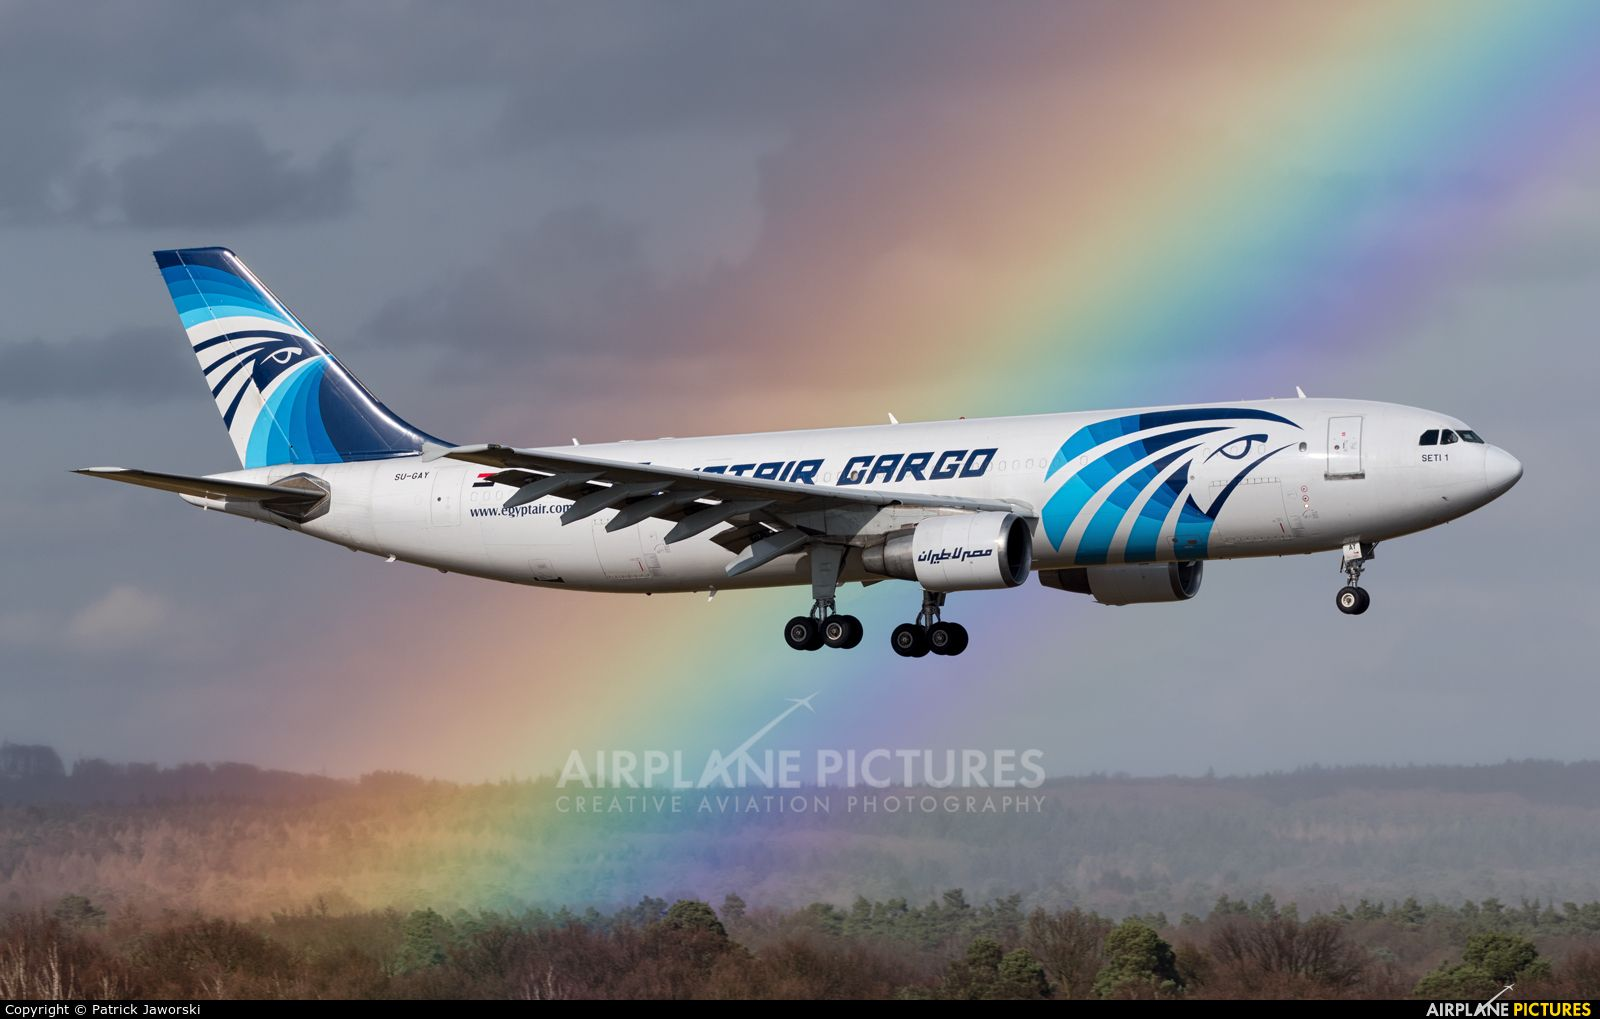 Egyptair Cargo Airbus A300 photo by Patrick Jaworski